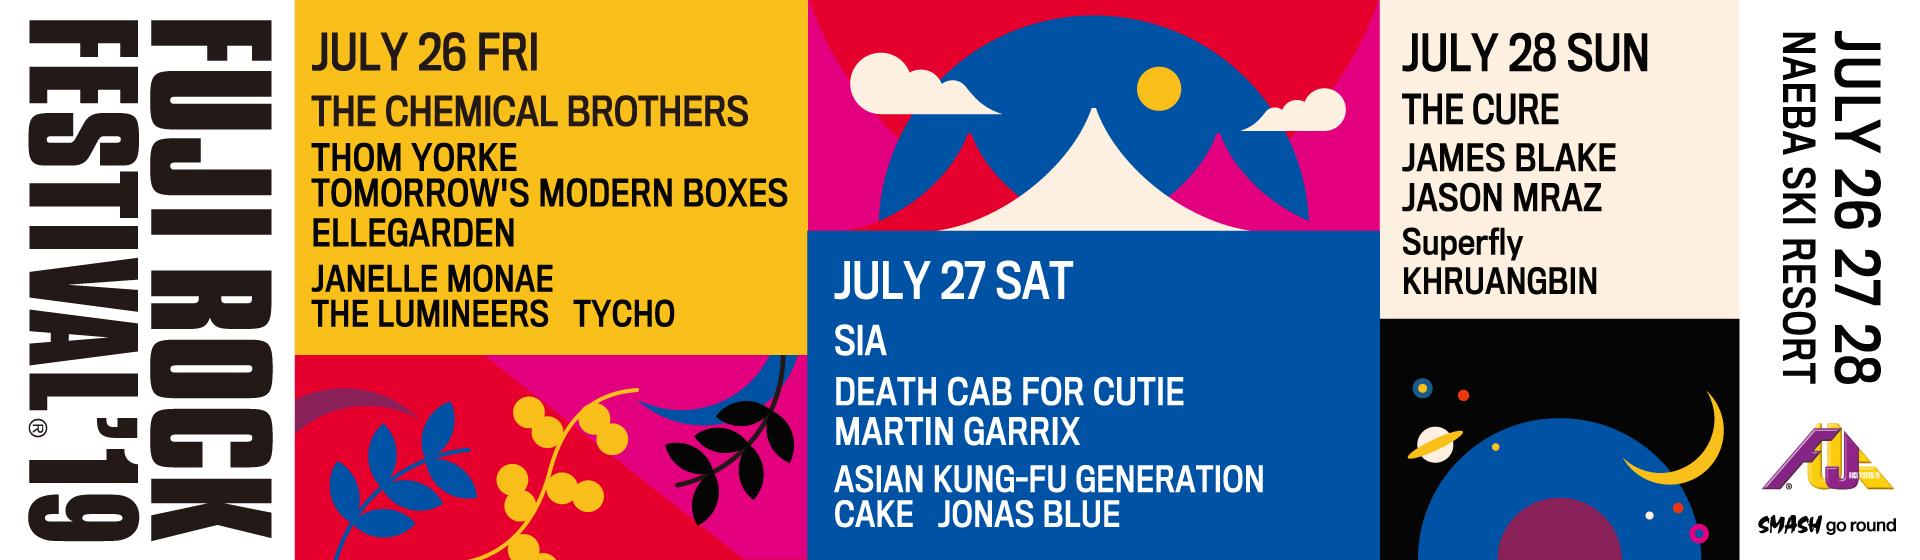 FUJI ROCK FESTIVAL'19 JULY 26 28 28 NAEBA SKI RESORT